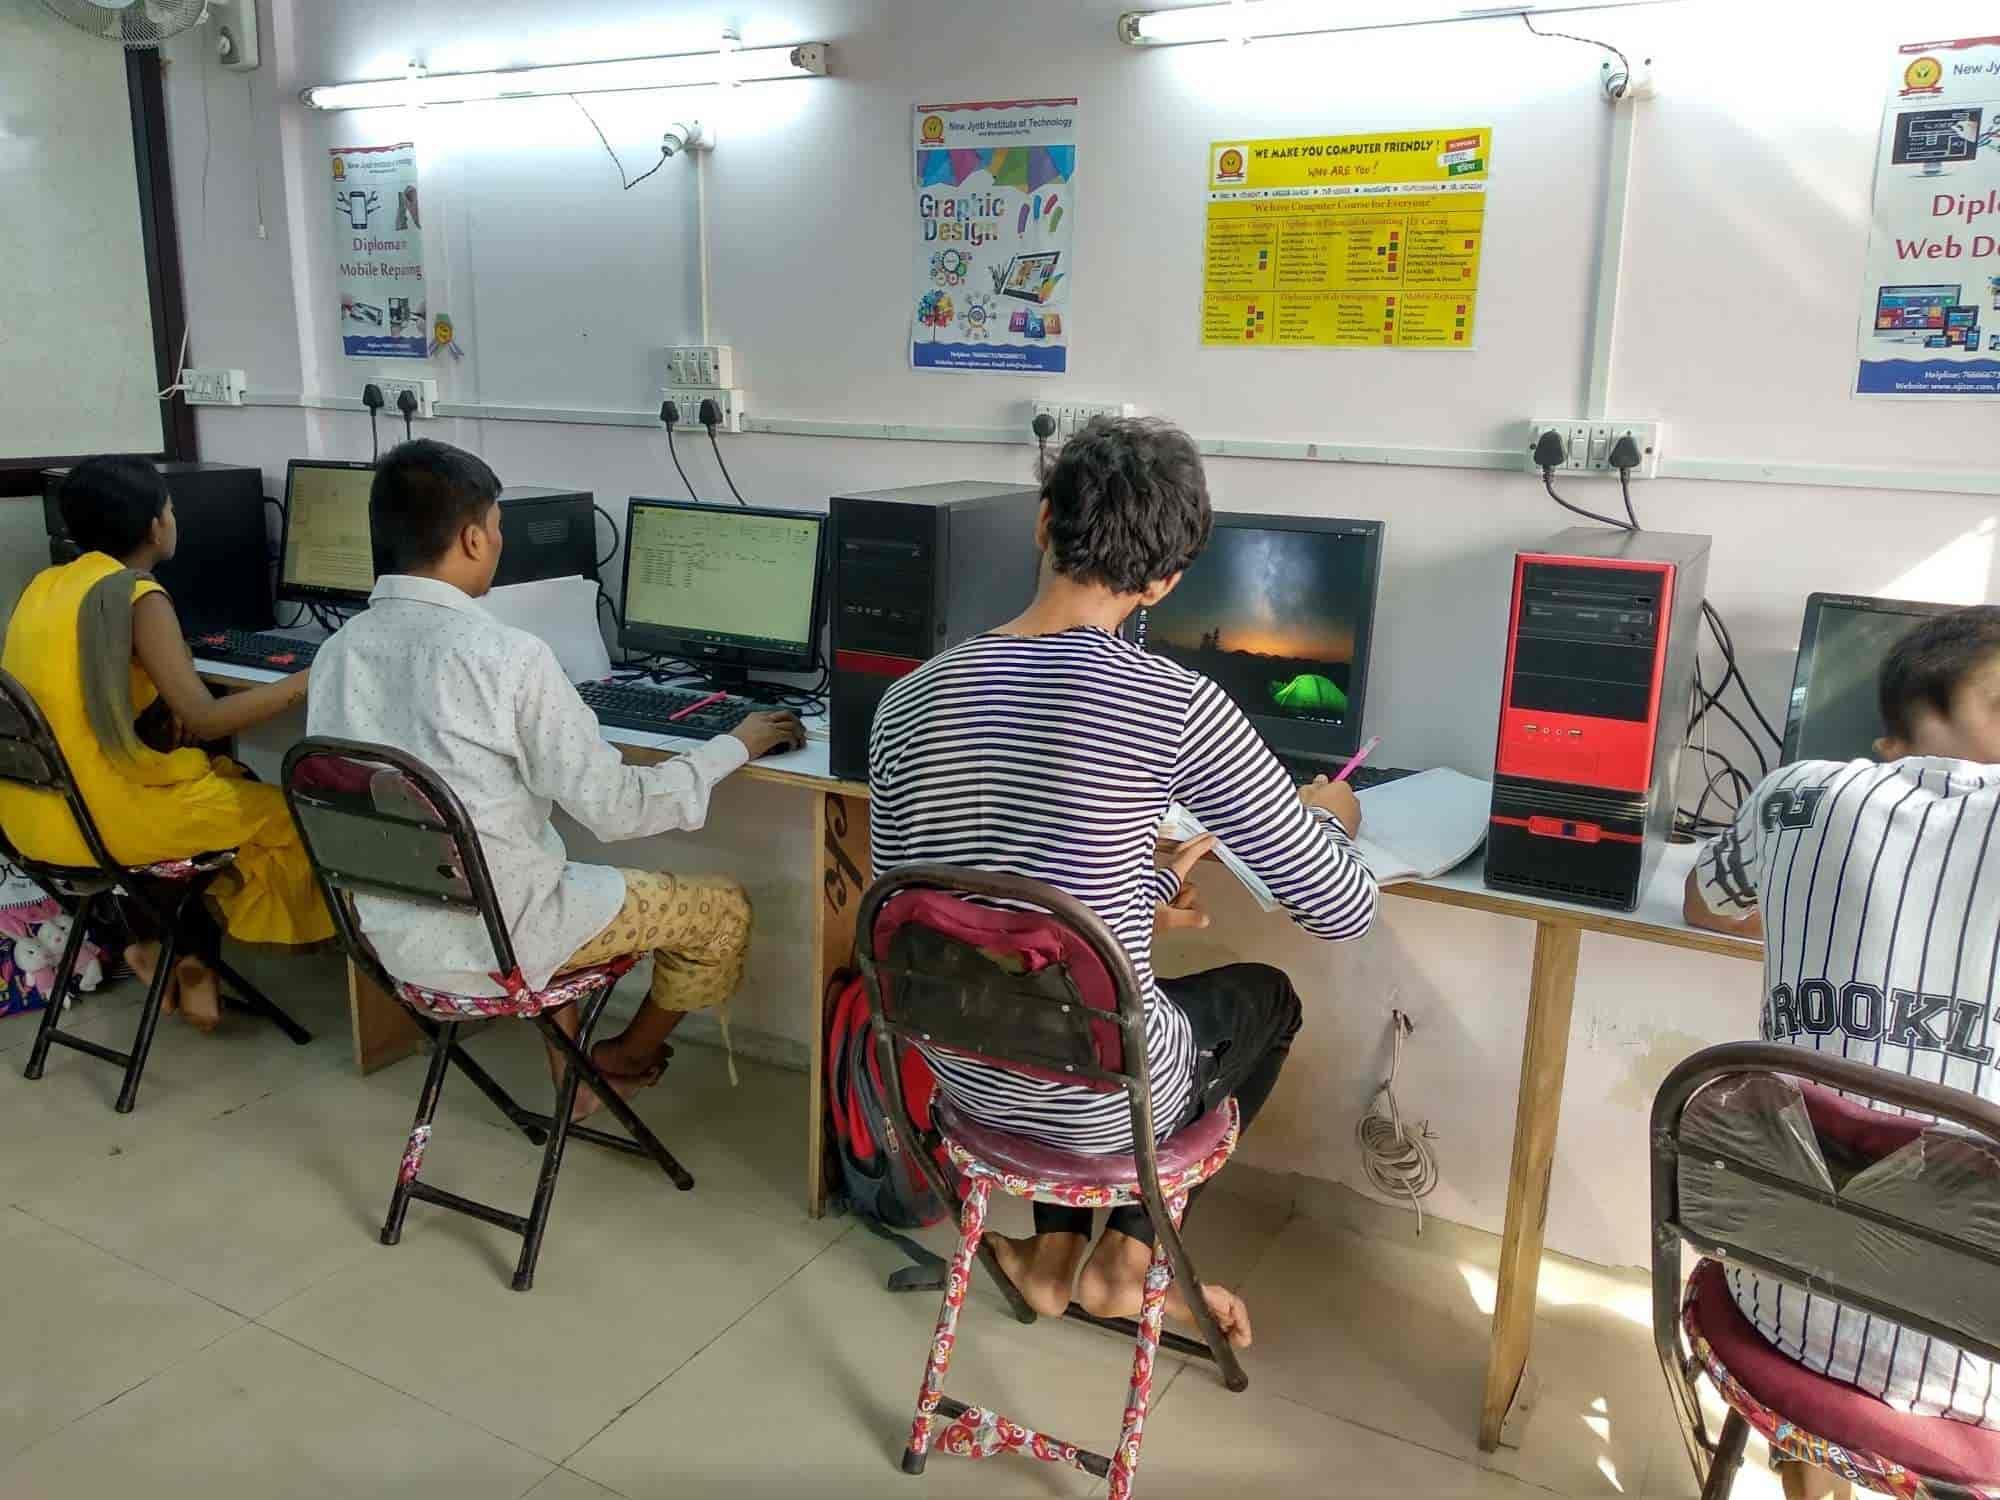 Top 10 Digital Marketing Courses In Nalasopara East Best Online Digital Marketing Courses Justdial